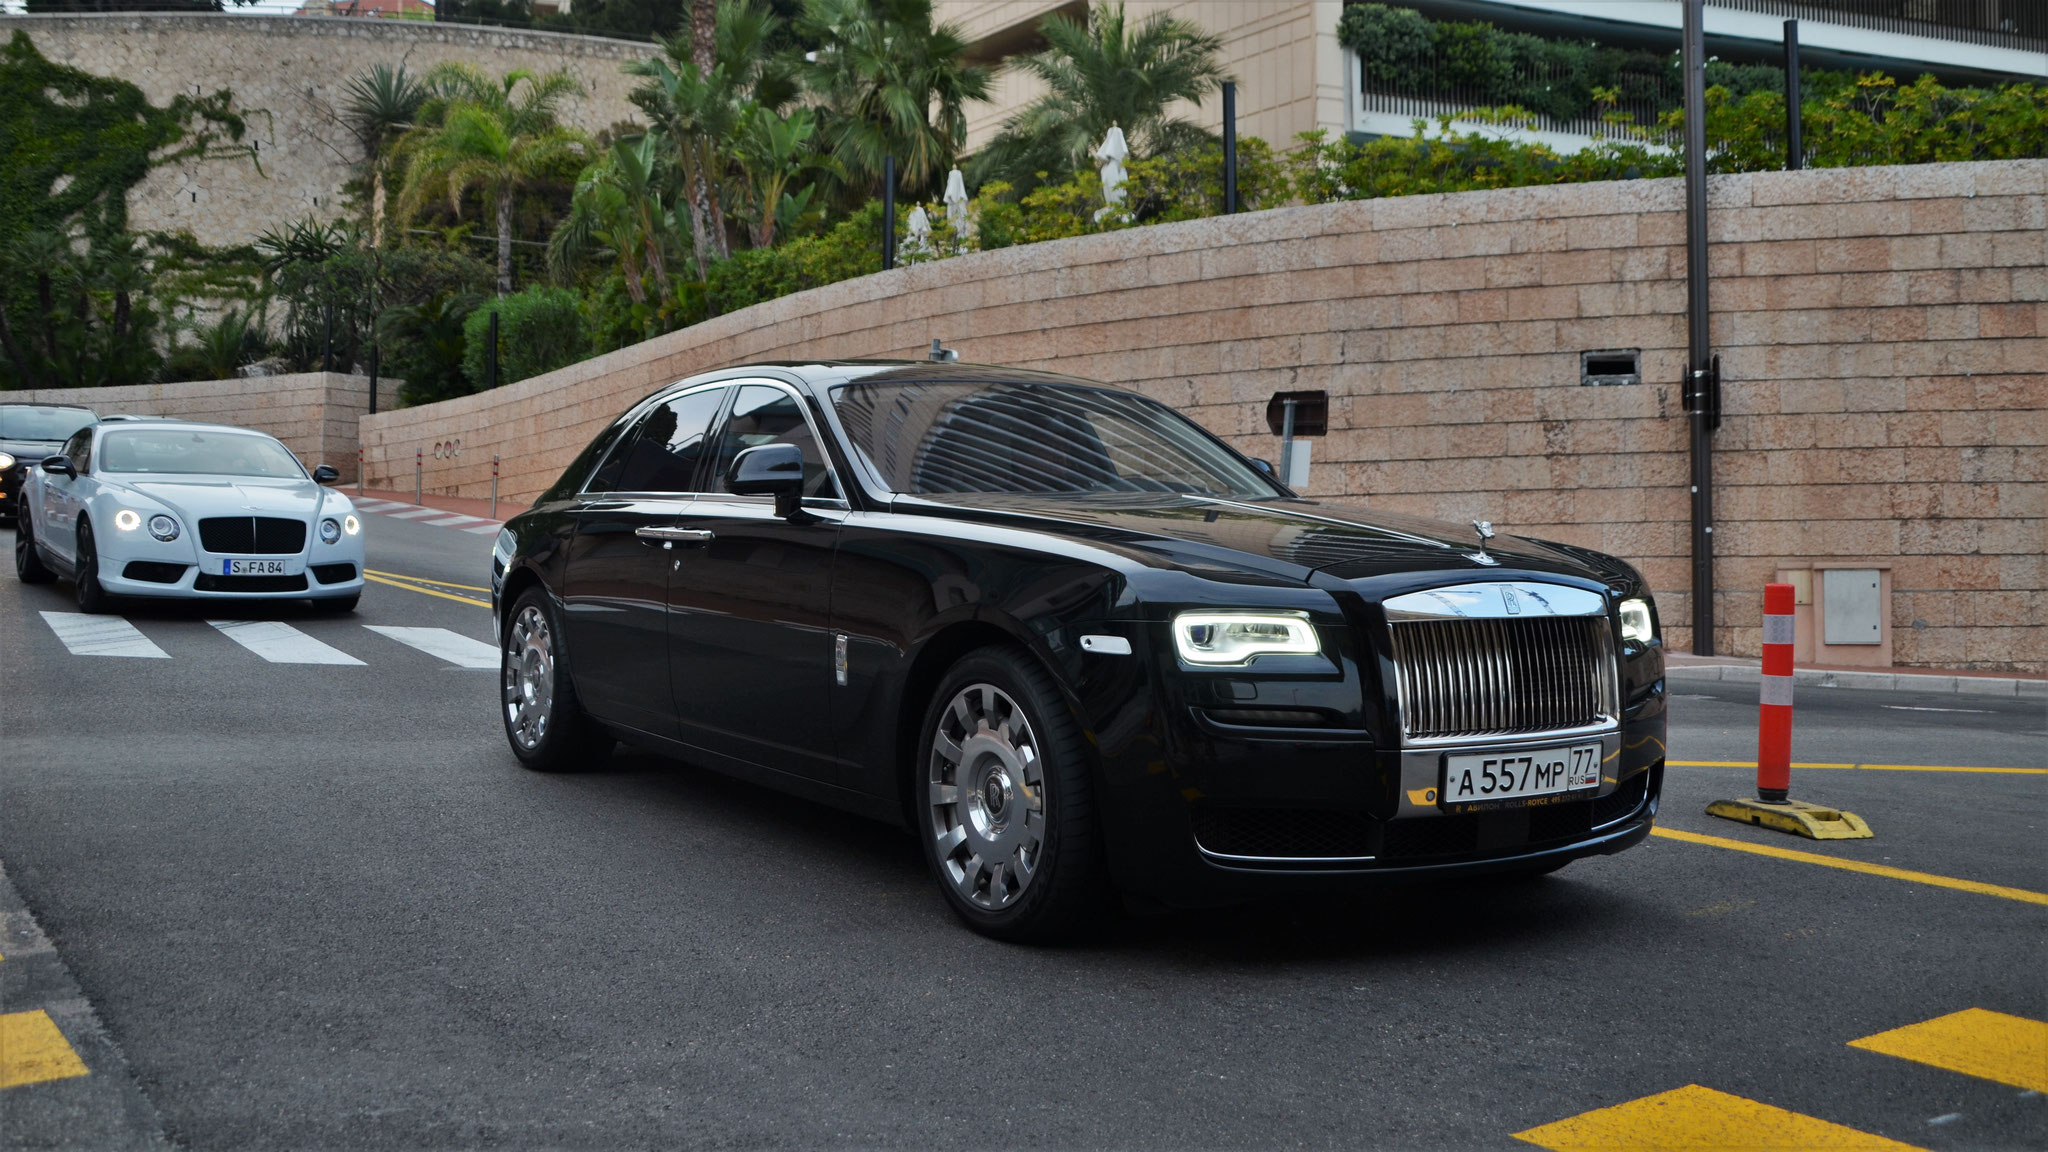 Rolls Royce Ghost Series II - A-557-MP-77 (RUS)